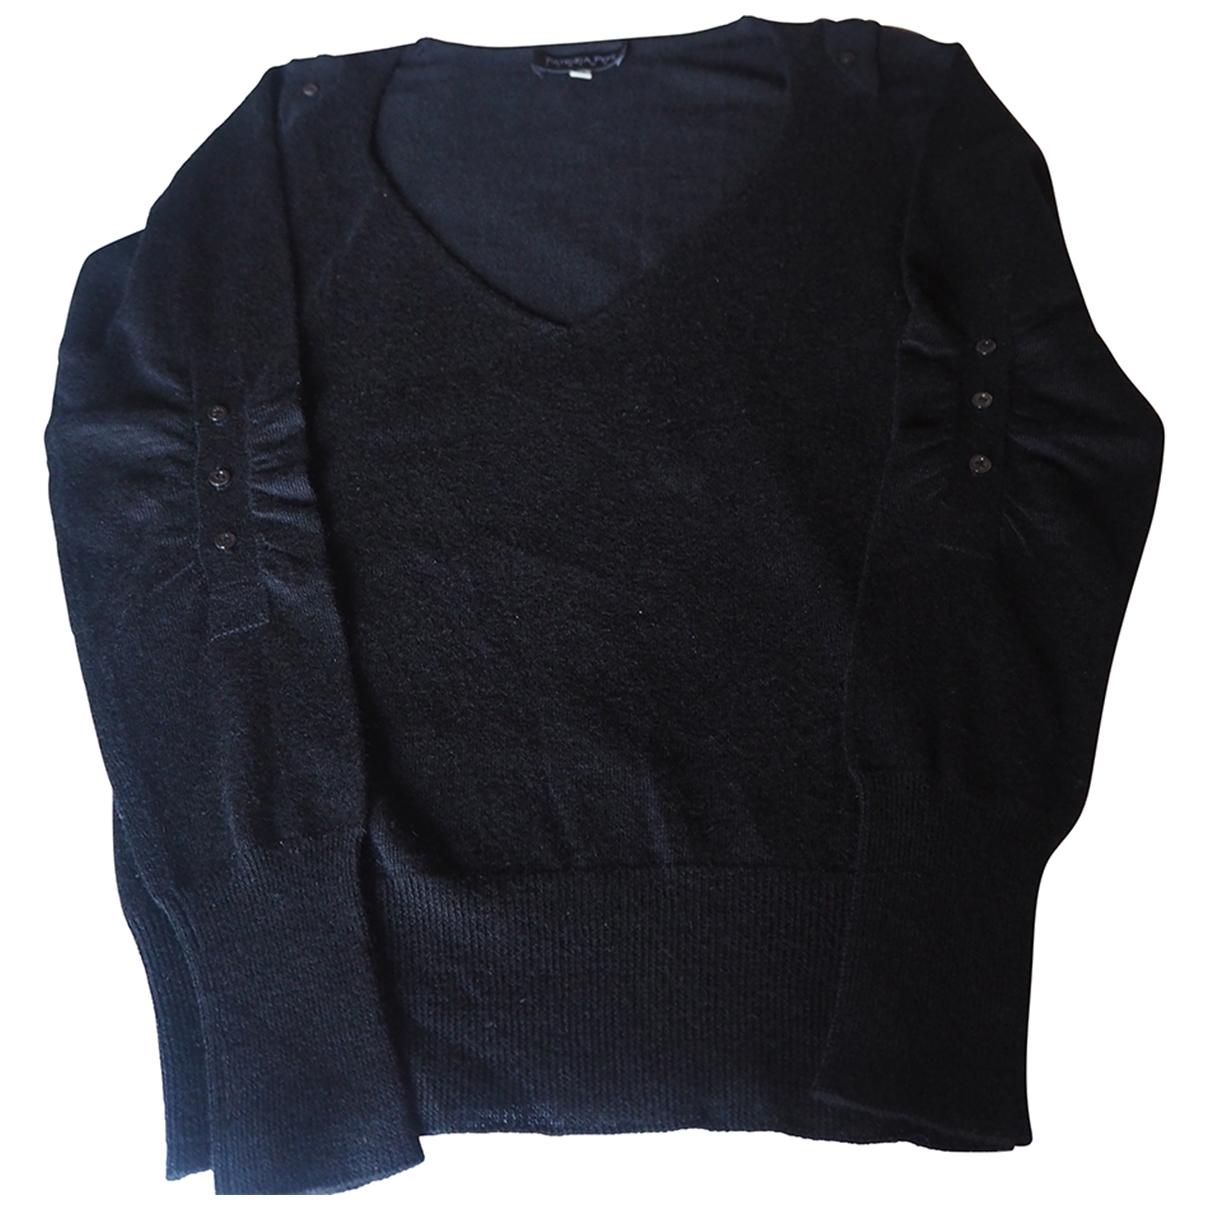 Patrizia Pepe \N Black Cashmere Knitwear for Women 42 IT